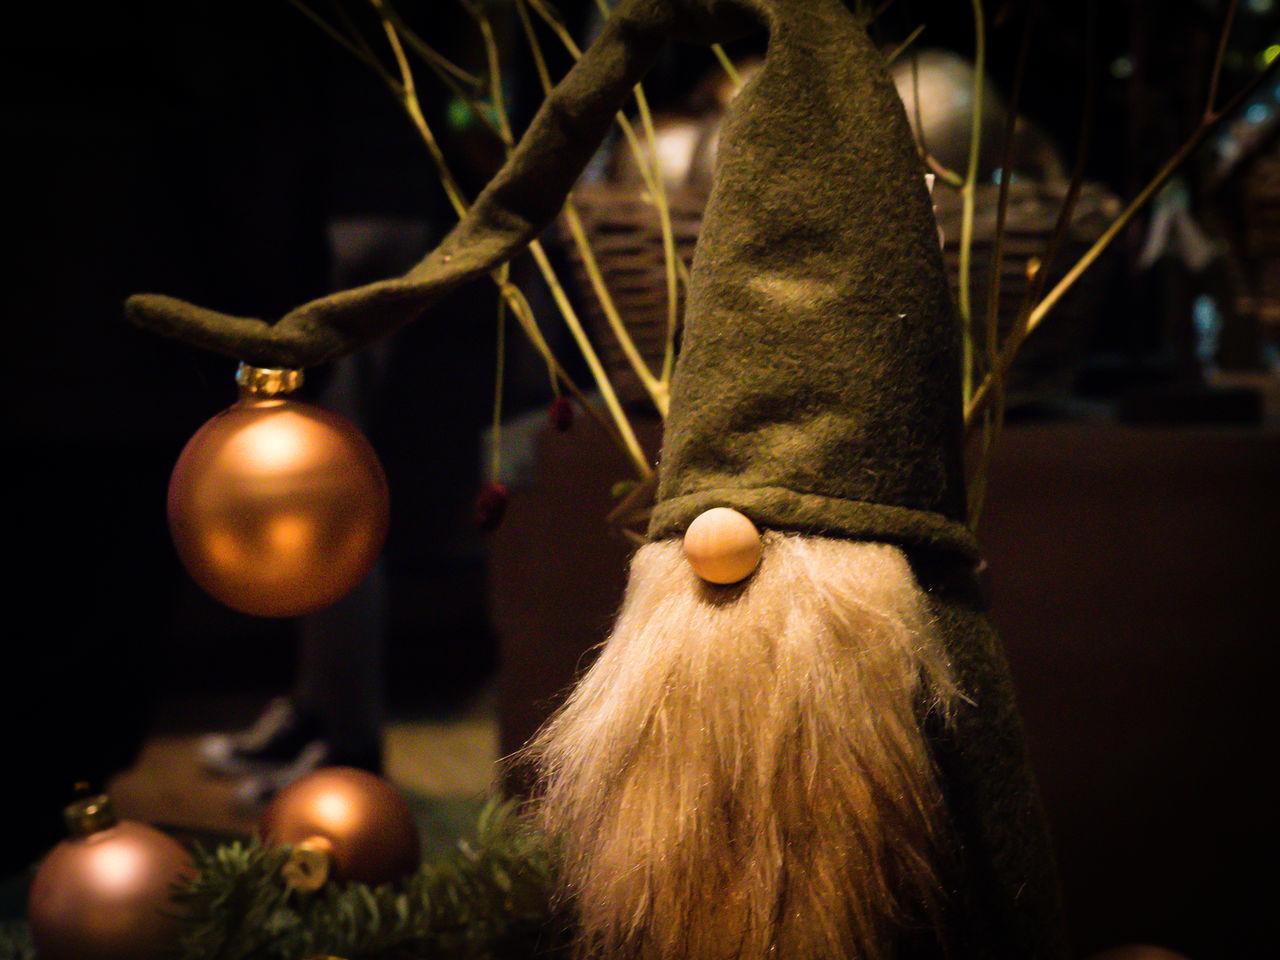 Christmas Christmastime Danmark Danskdesign Decoration Decorative Godjul Indoor Photography Nisse